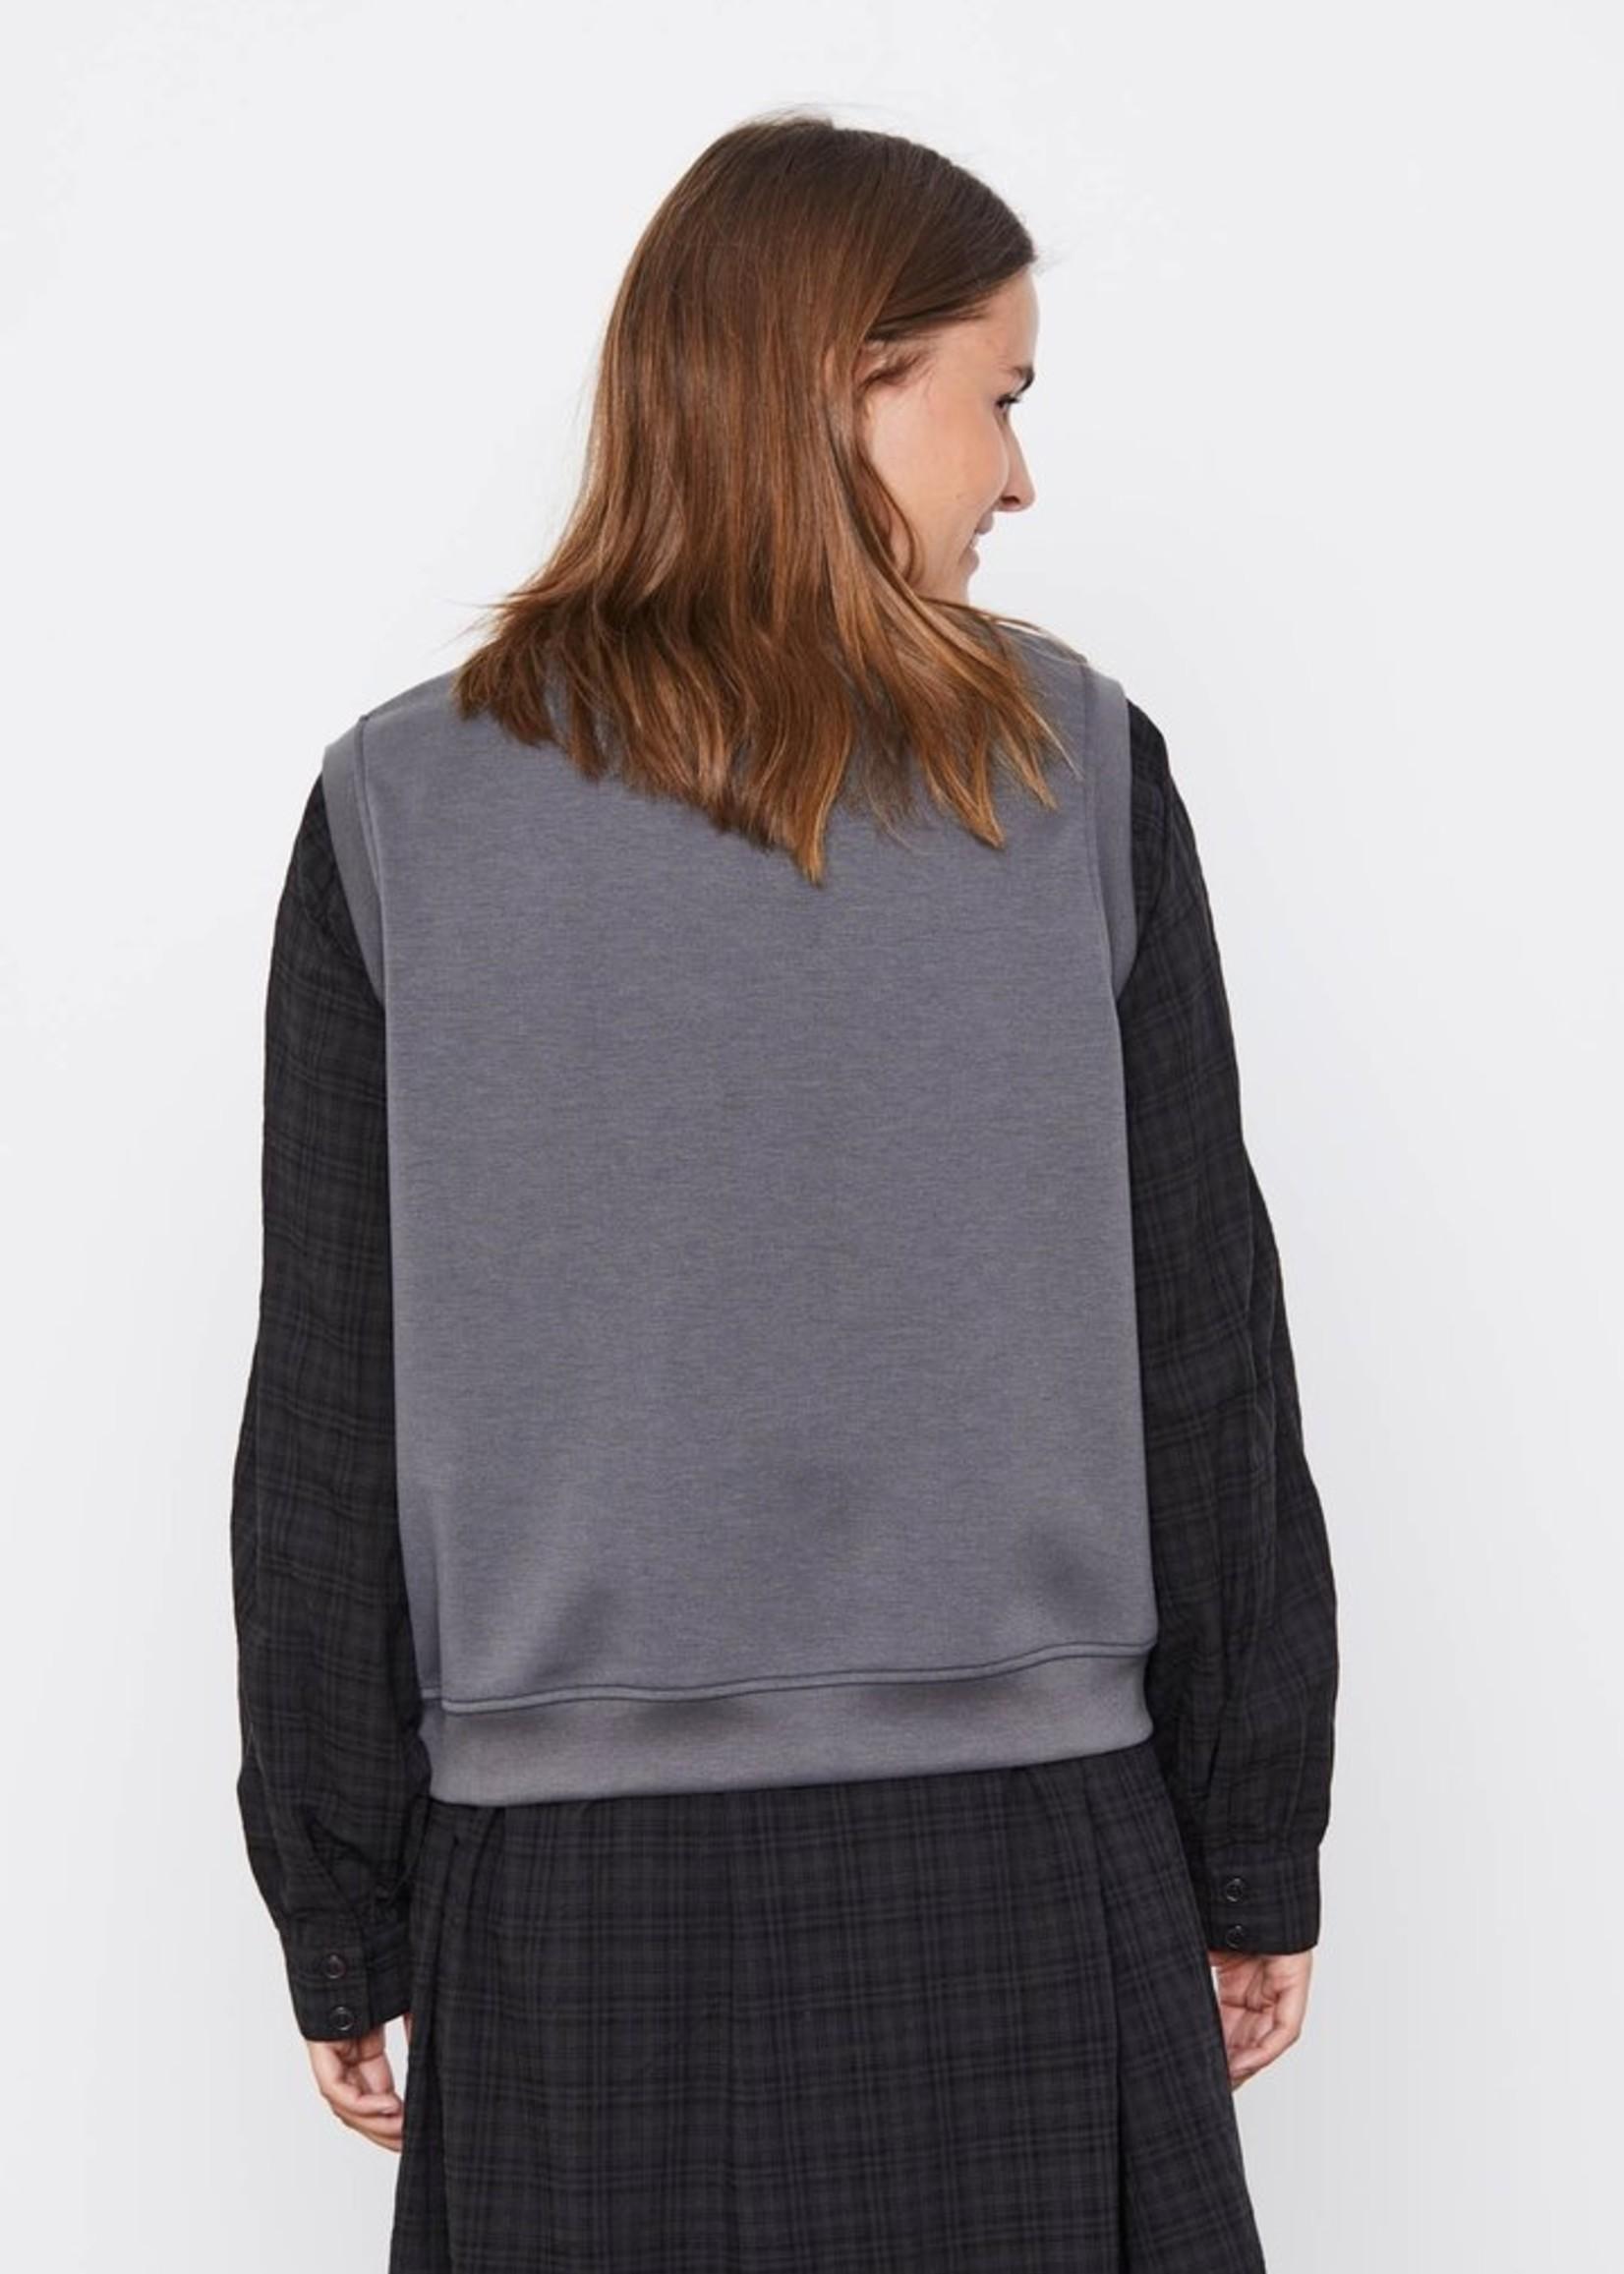 Soft Rebels SRCara Vest